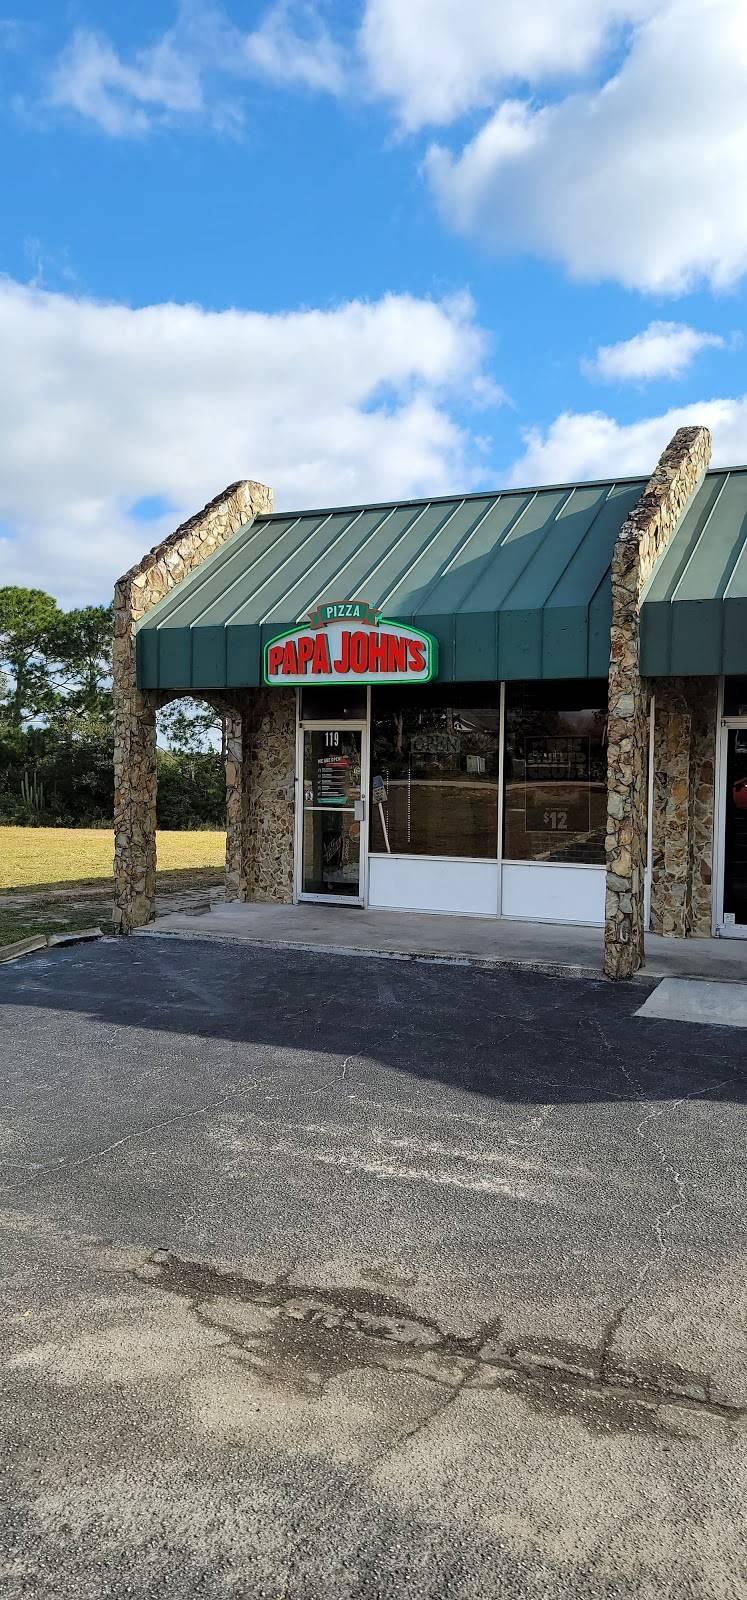 Papa Johns Pizza | restaurant | 119 U.S. 27 South, Lake Placid, FL 33852, USA | 8636594390 OR +1 863-659-4390